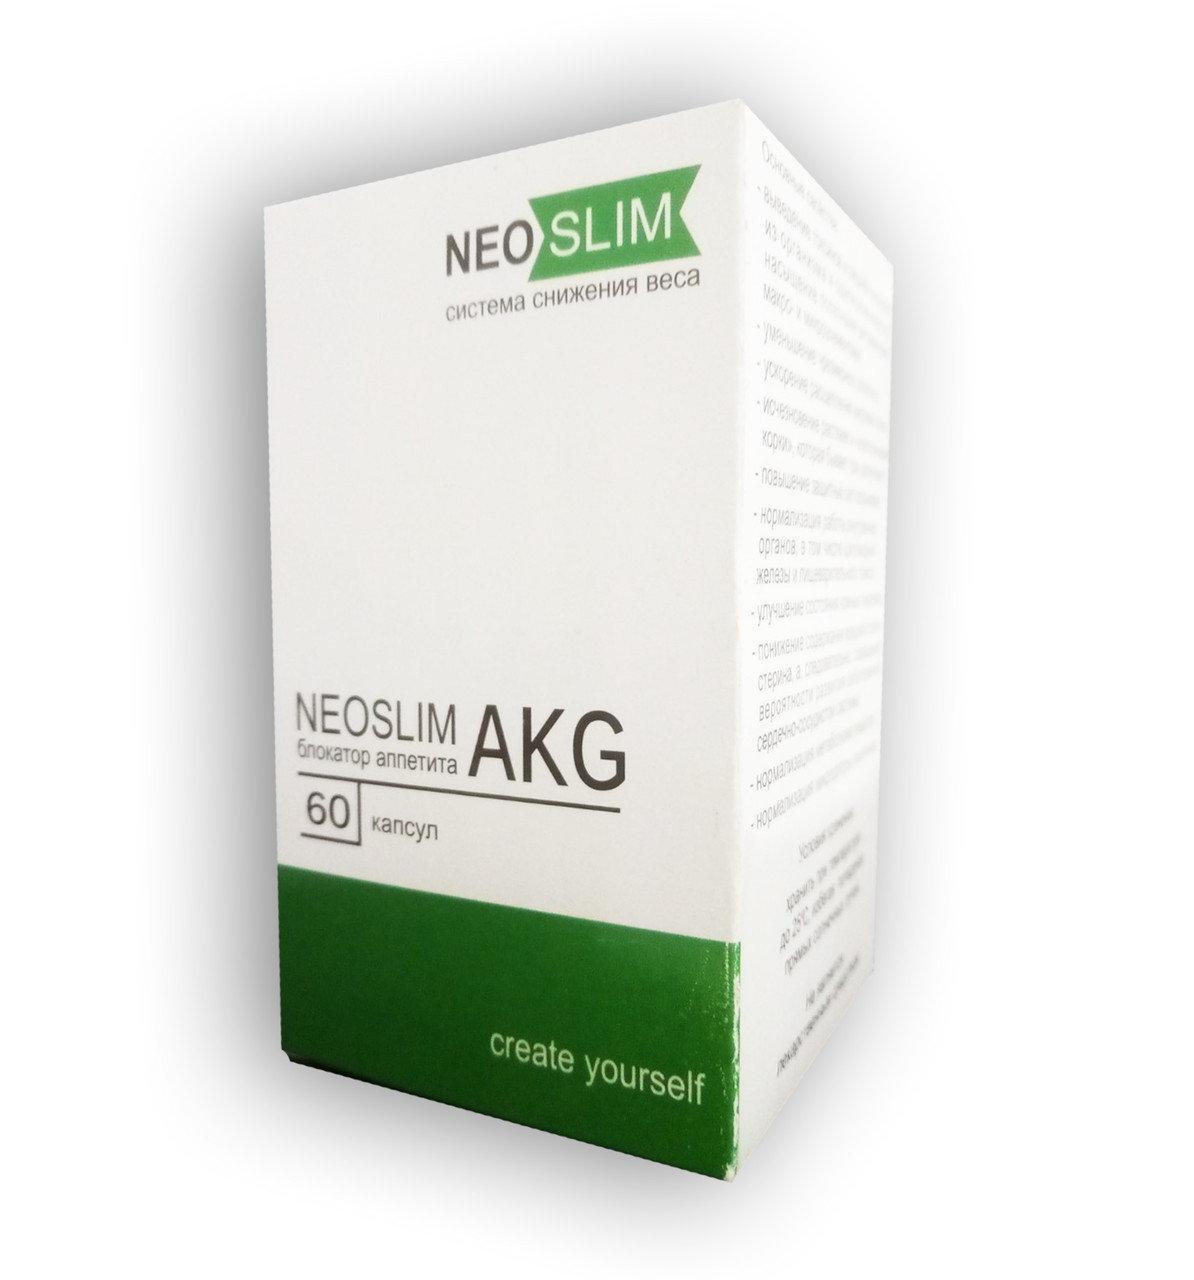 Neo Slim AKG (60) - Комплекс для снижения веса (Нео Слим АКГ)